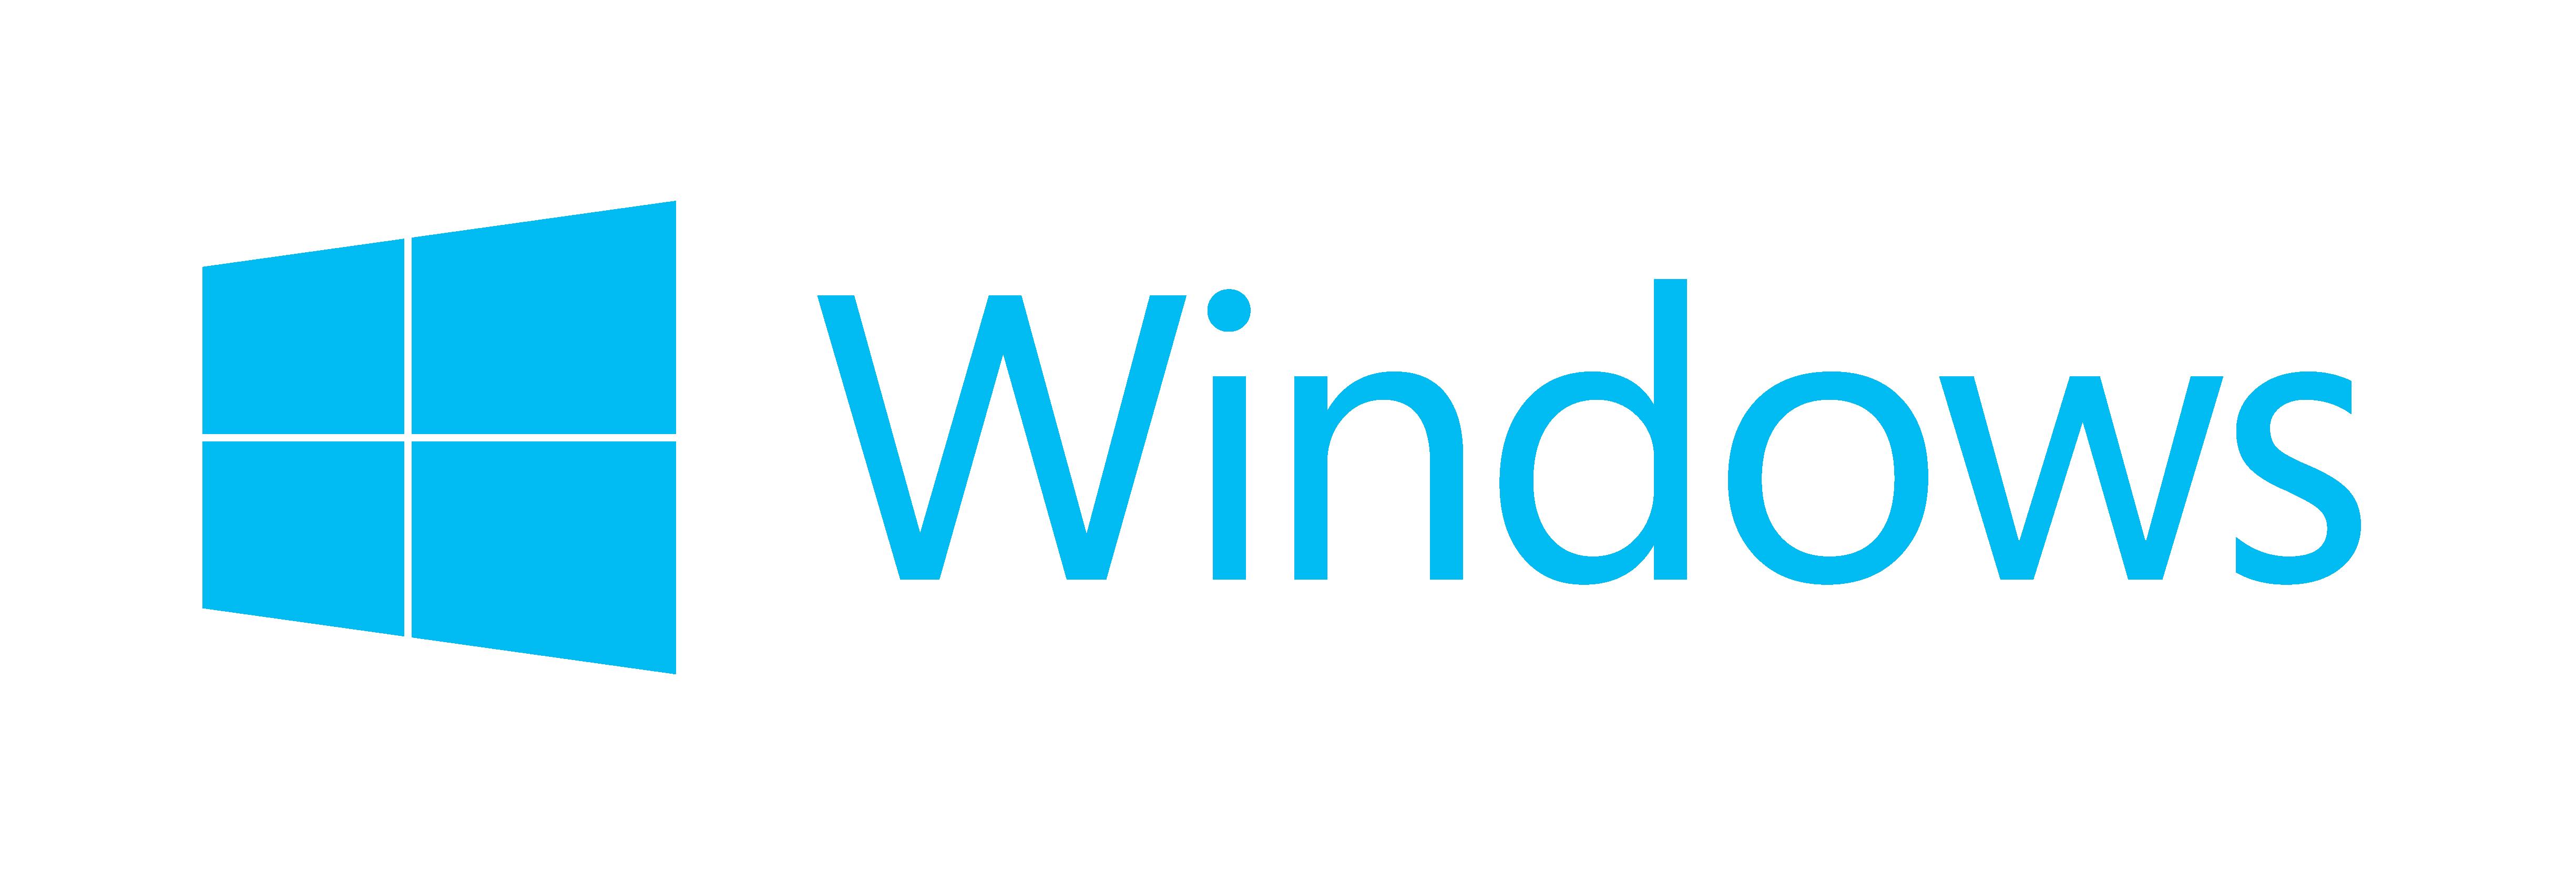 Download PNG image - Microsoft Windows Png Clipart - Microsoft Windows 10 PNG